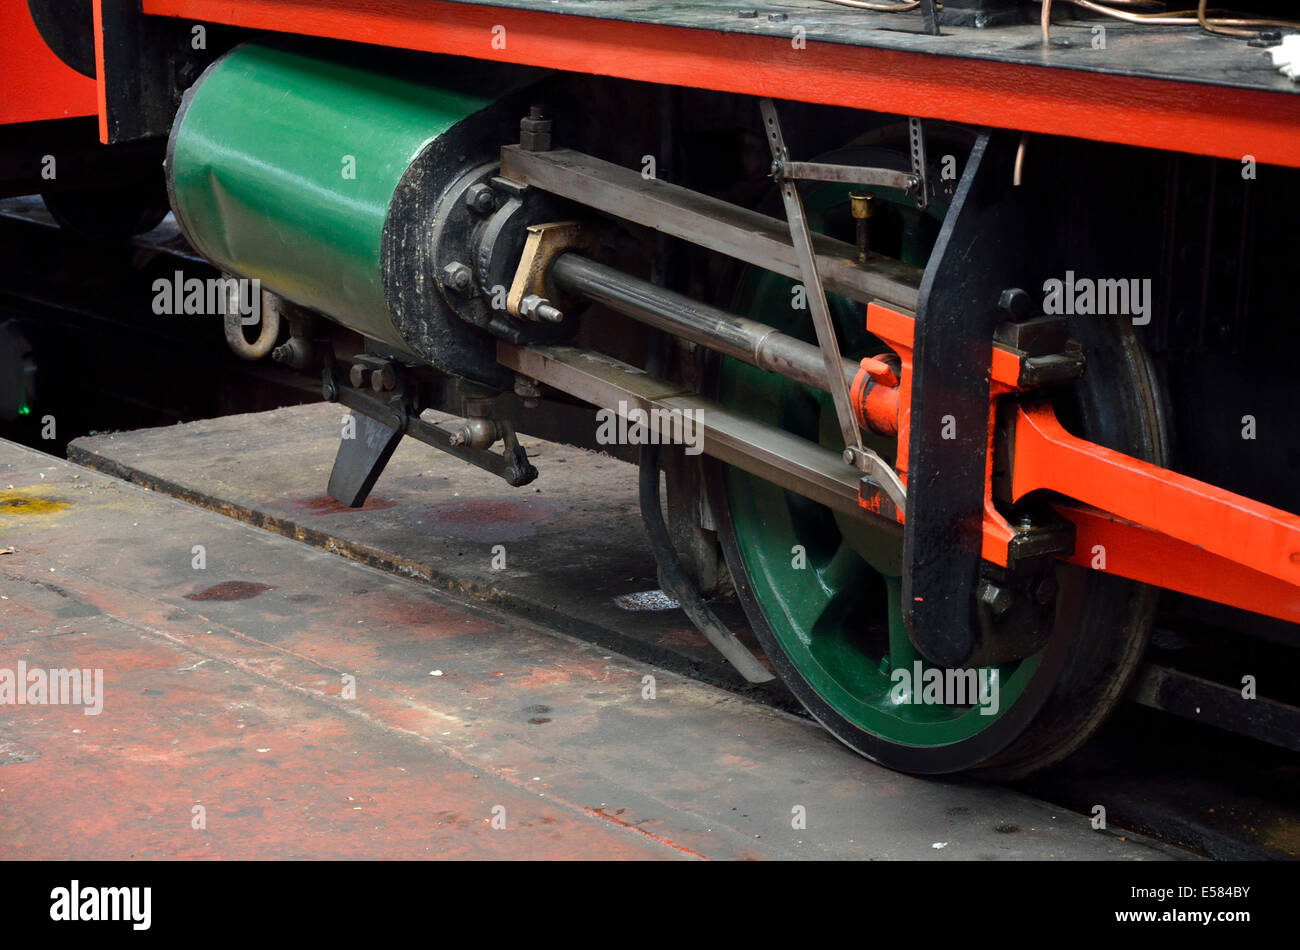 Chatham, Kent, England, UK. Chatham Historic Dockyard. Steam locomotive 'Ajax' (RSH 7042/1941, 0-4-0SH) built by Stock Photo